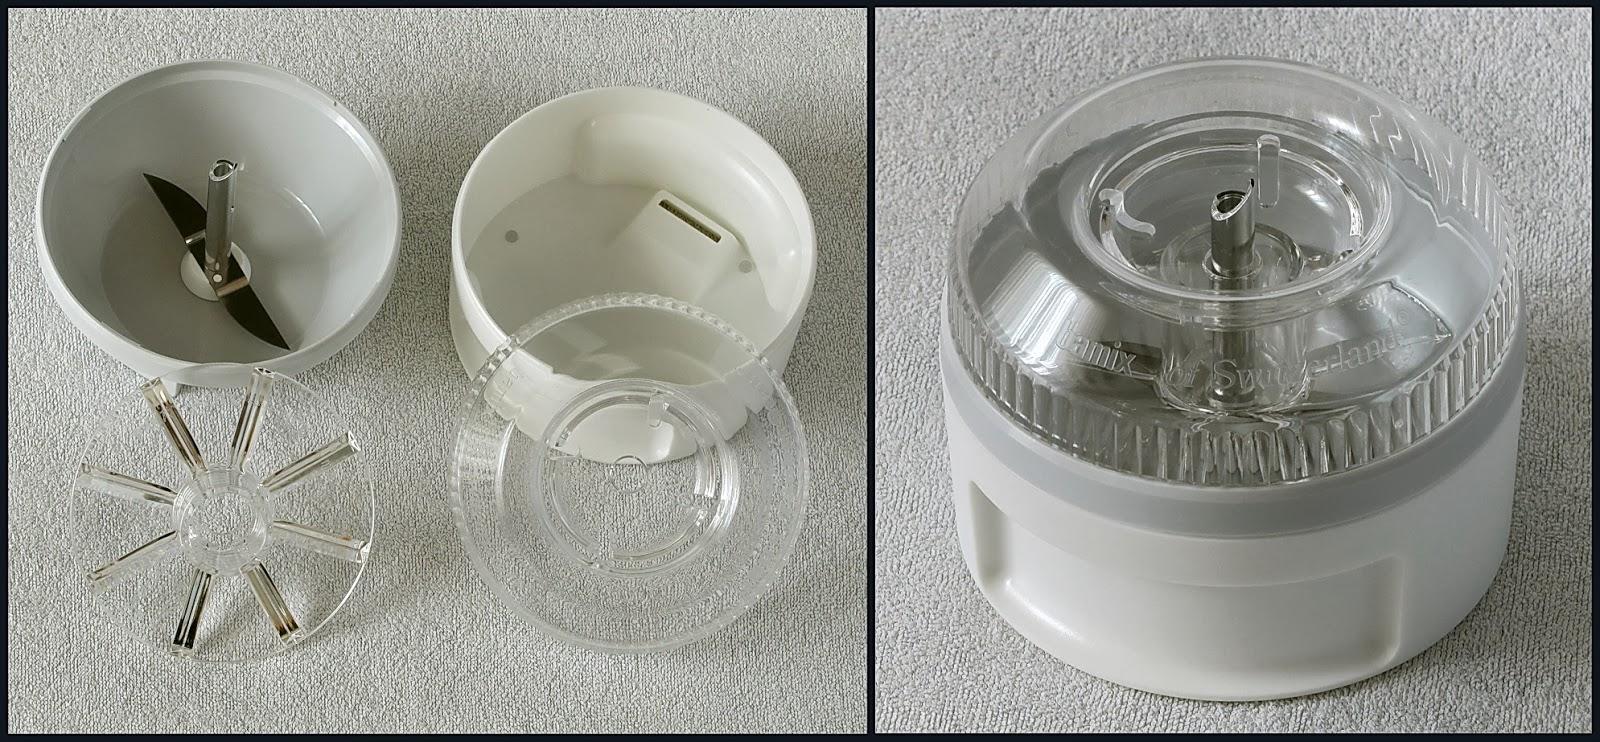 Bamix,Tritatutto (processor grinder)